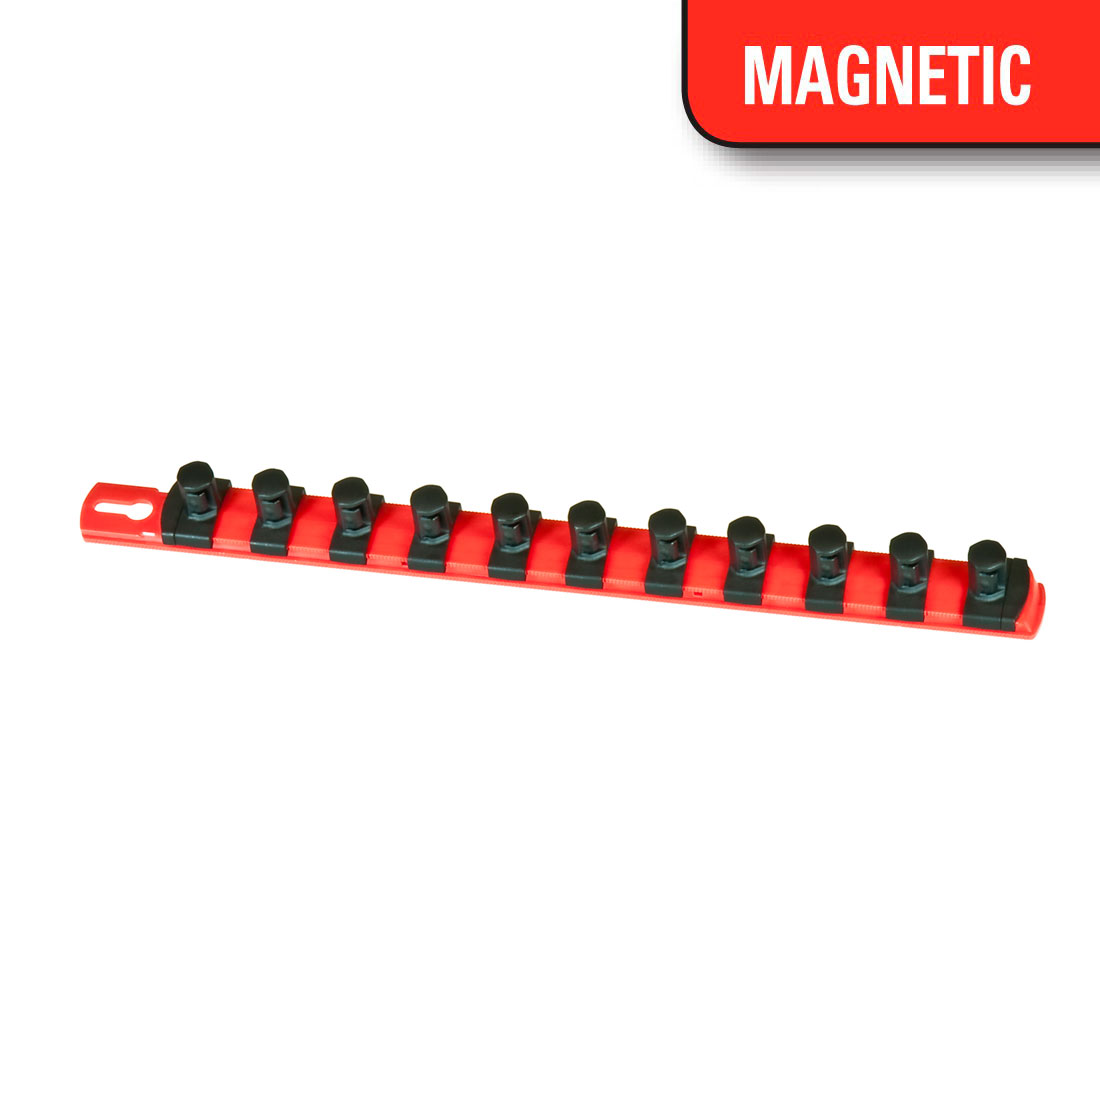 13u201d Magnetic Socket Organizer w/Twist Lock Clips - Red ...  sc 1 st  Ernst Manufacturing & 13u201d Magnetic Socket Organizer w/Twist Lock Clips - Red #